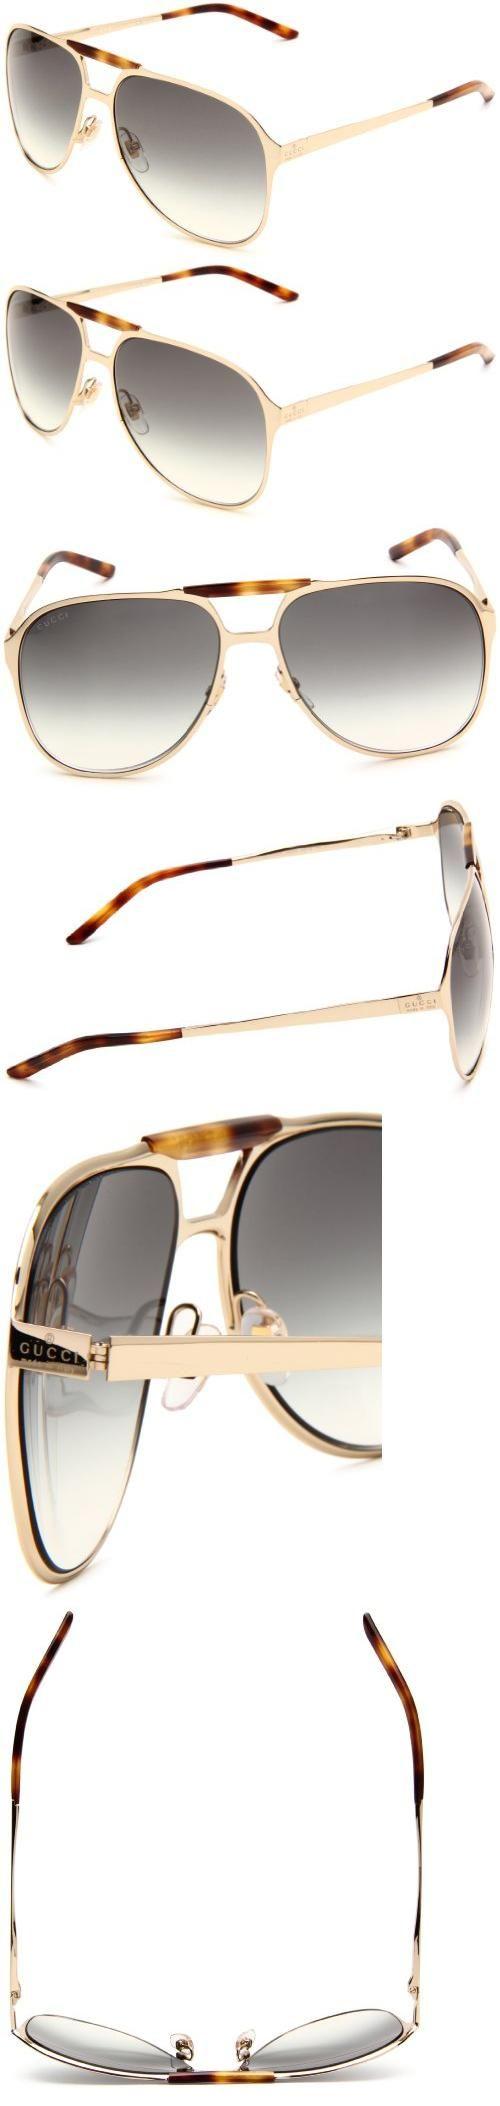 181 best Man Eyewear images on Pinterest | Sunglasses, Eye glasses ...